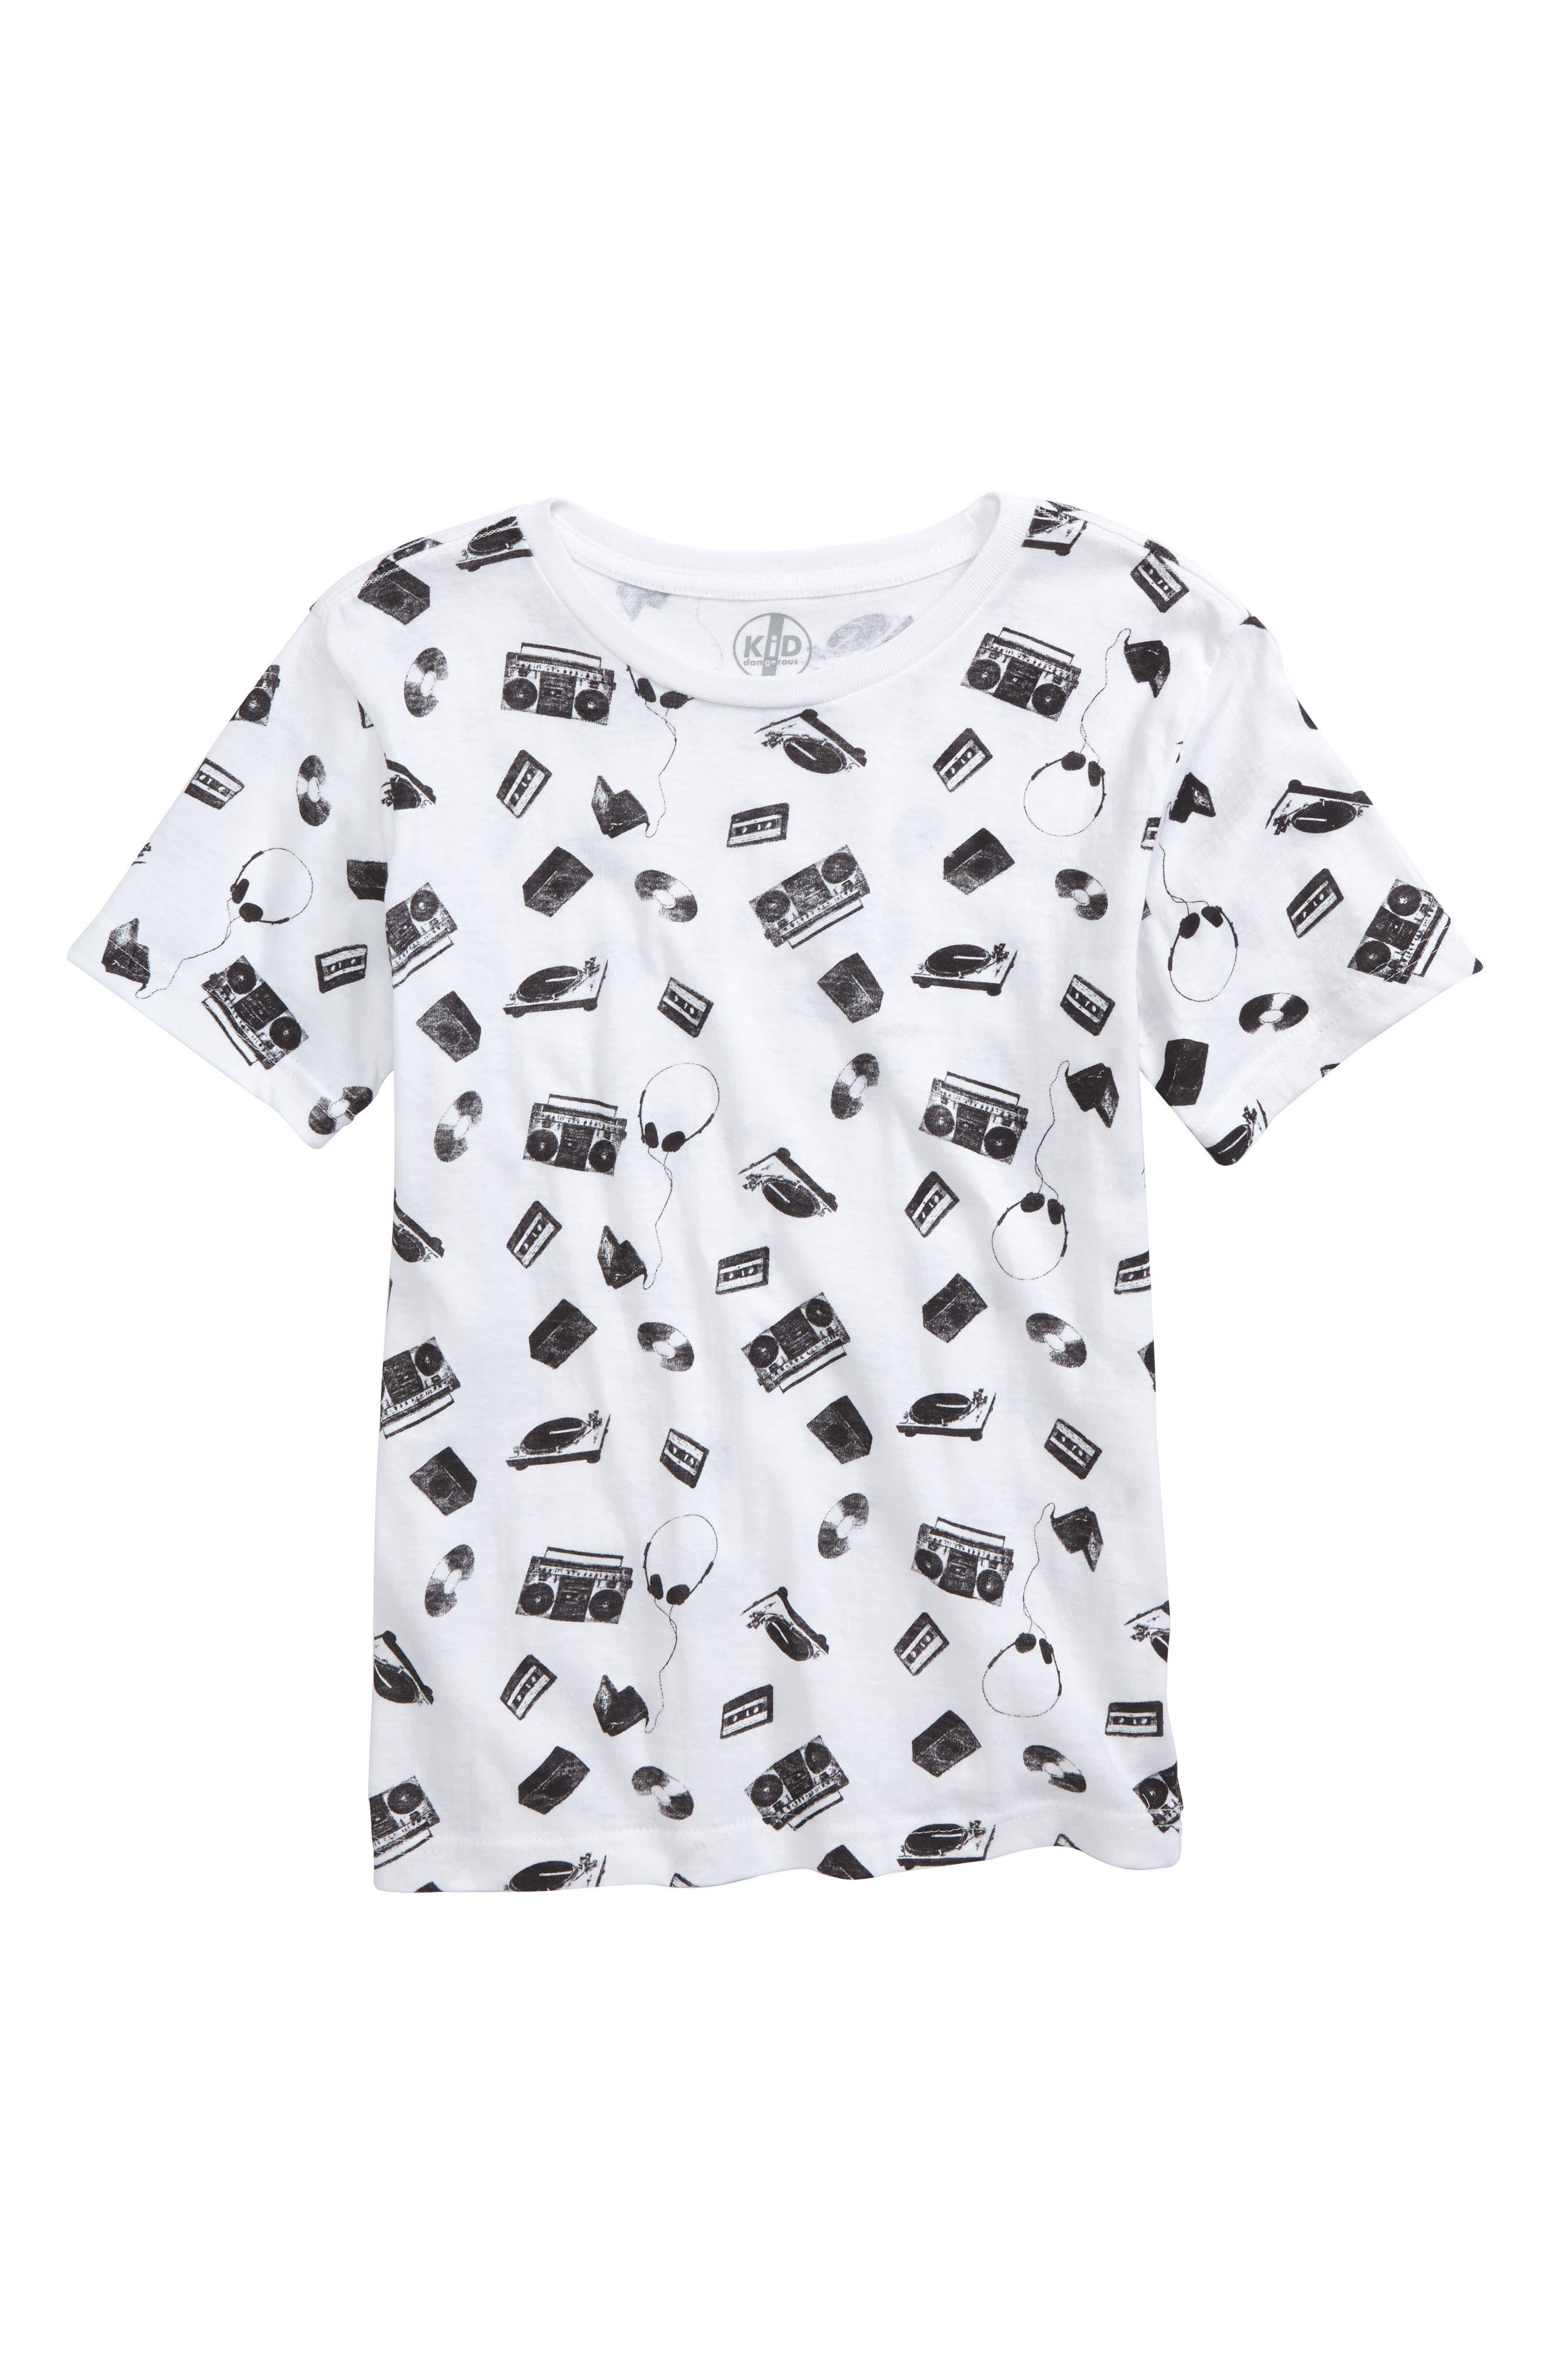 Kid Dangerous Music All Over Graphic T-Shirt (Big Boys)